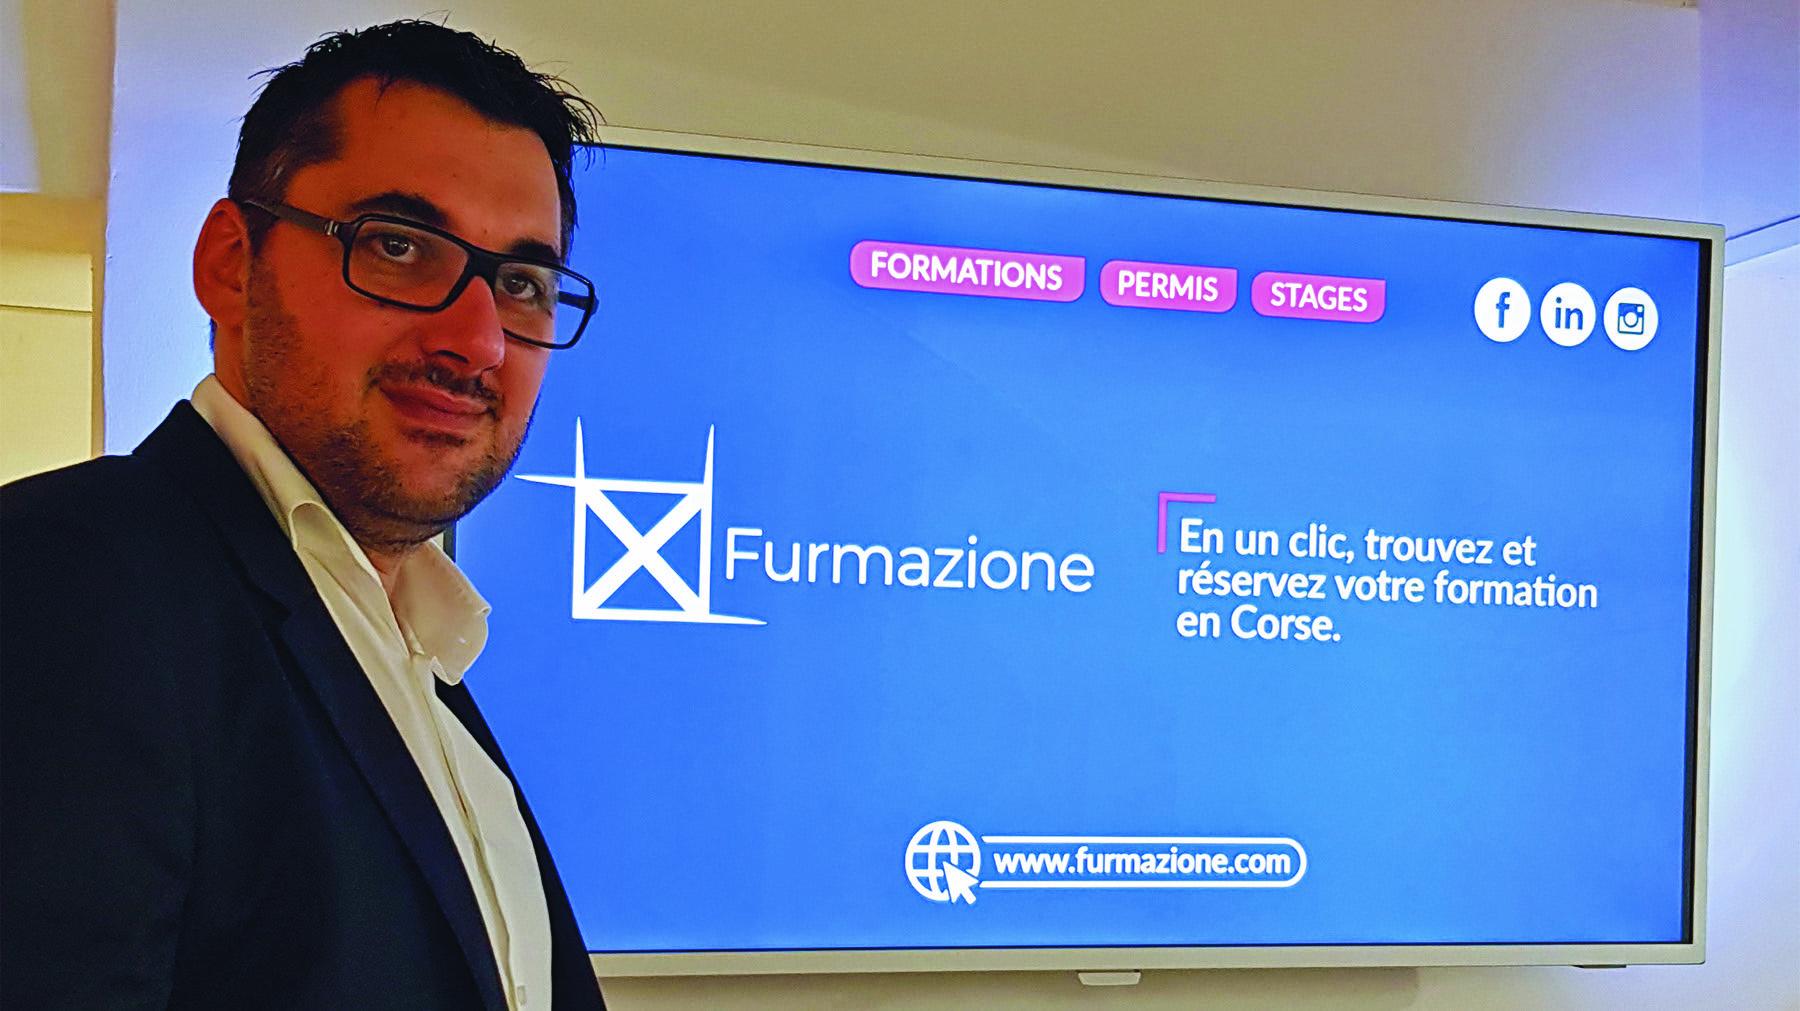 Jean-Antoine Mattei, créateur de la plateforme Furmazione.